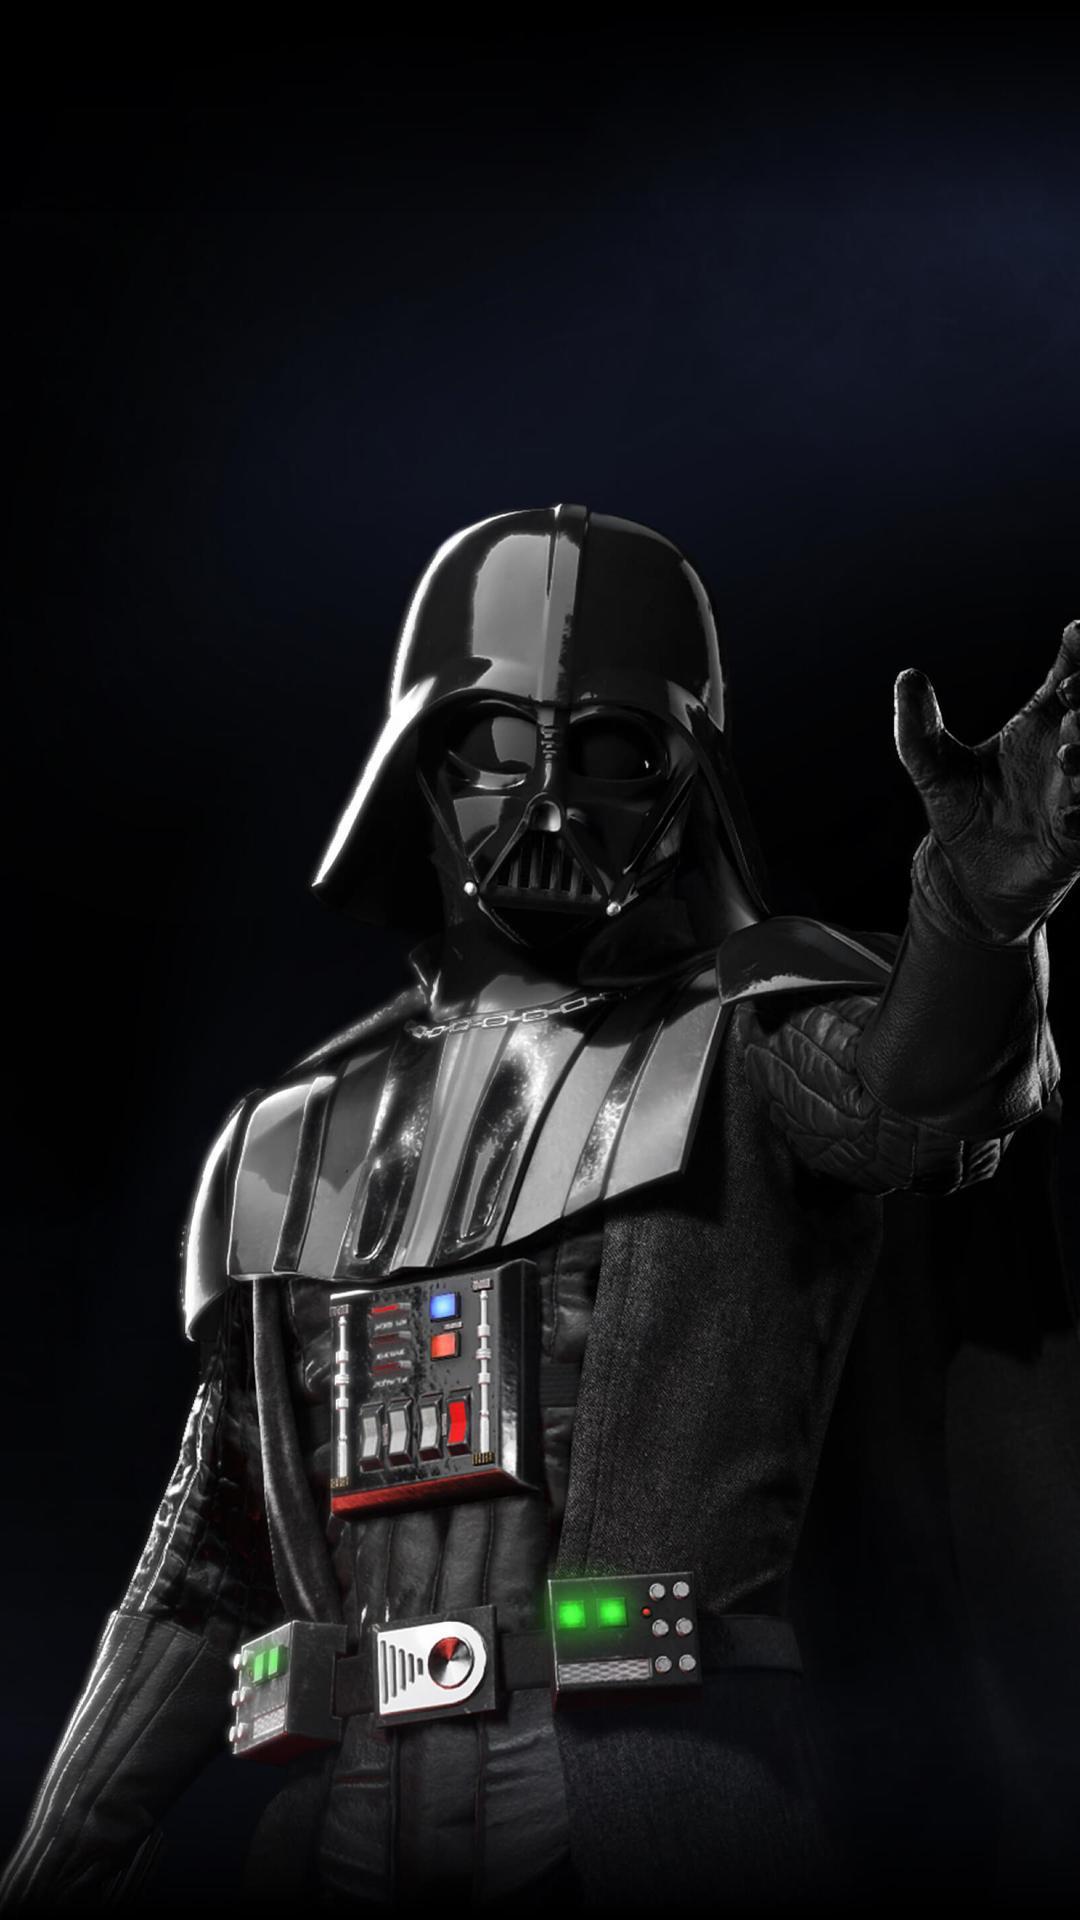 100 wallpapers hd star wars fondos de pantalla for Fondo de pantalla star wars